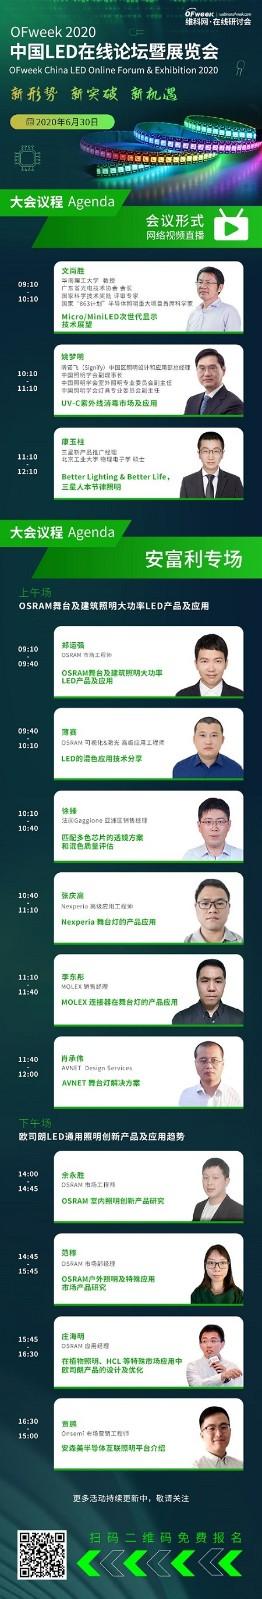 """OFweek2020中国LED在线论坛暨展览会-安富利专场论坛""将于6月30日举办"